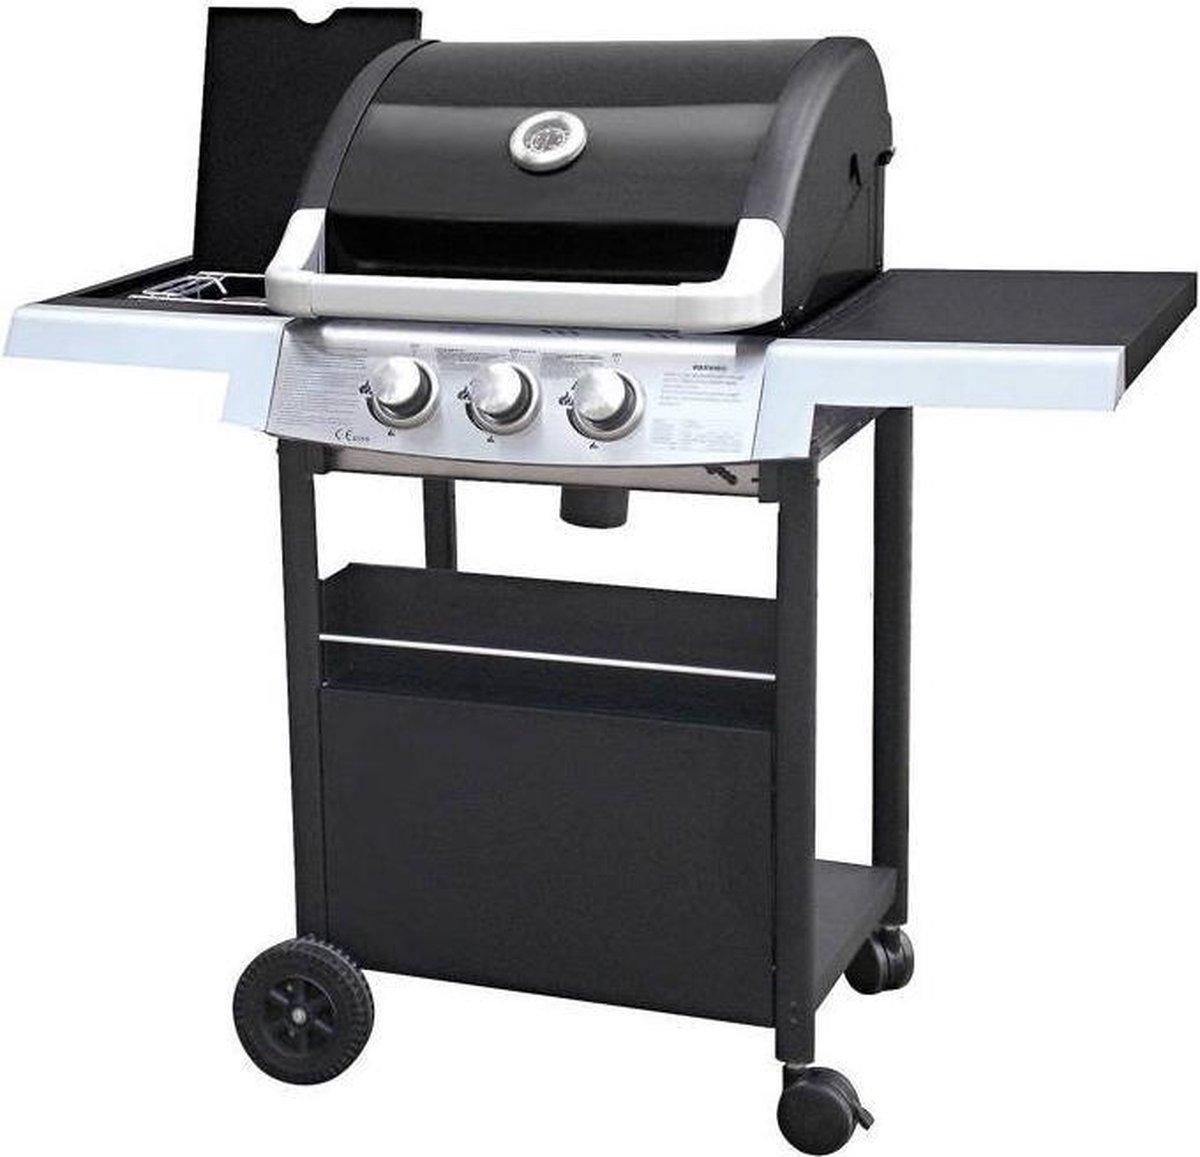 Garden Grill Experience 2+1 Gasbarbecue - 3 Branders - Zwart